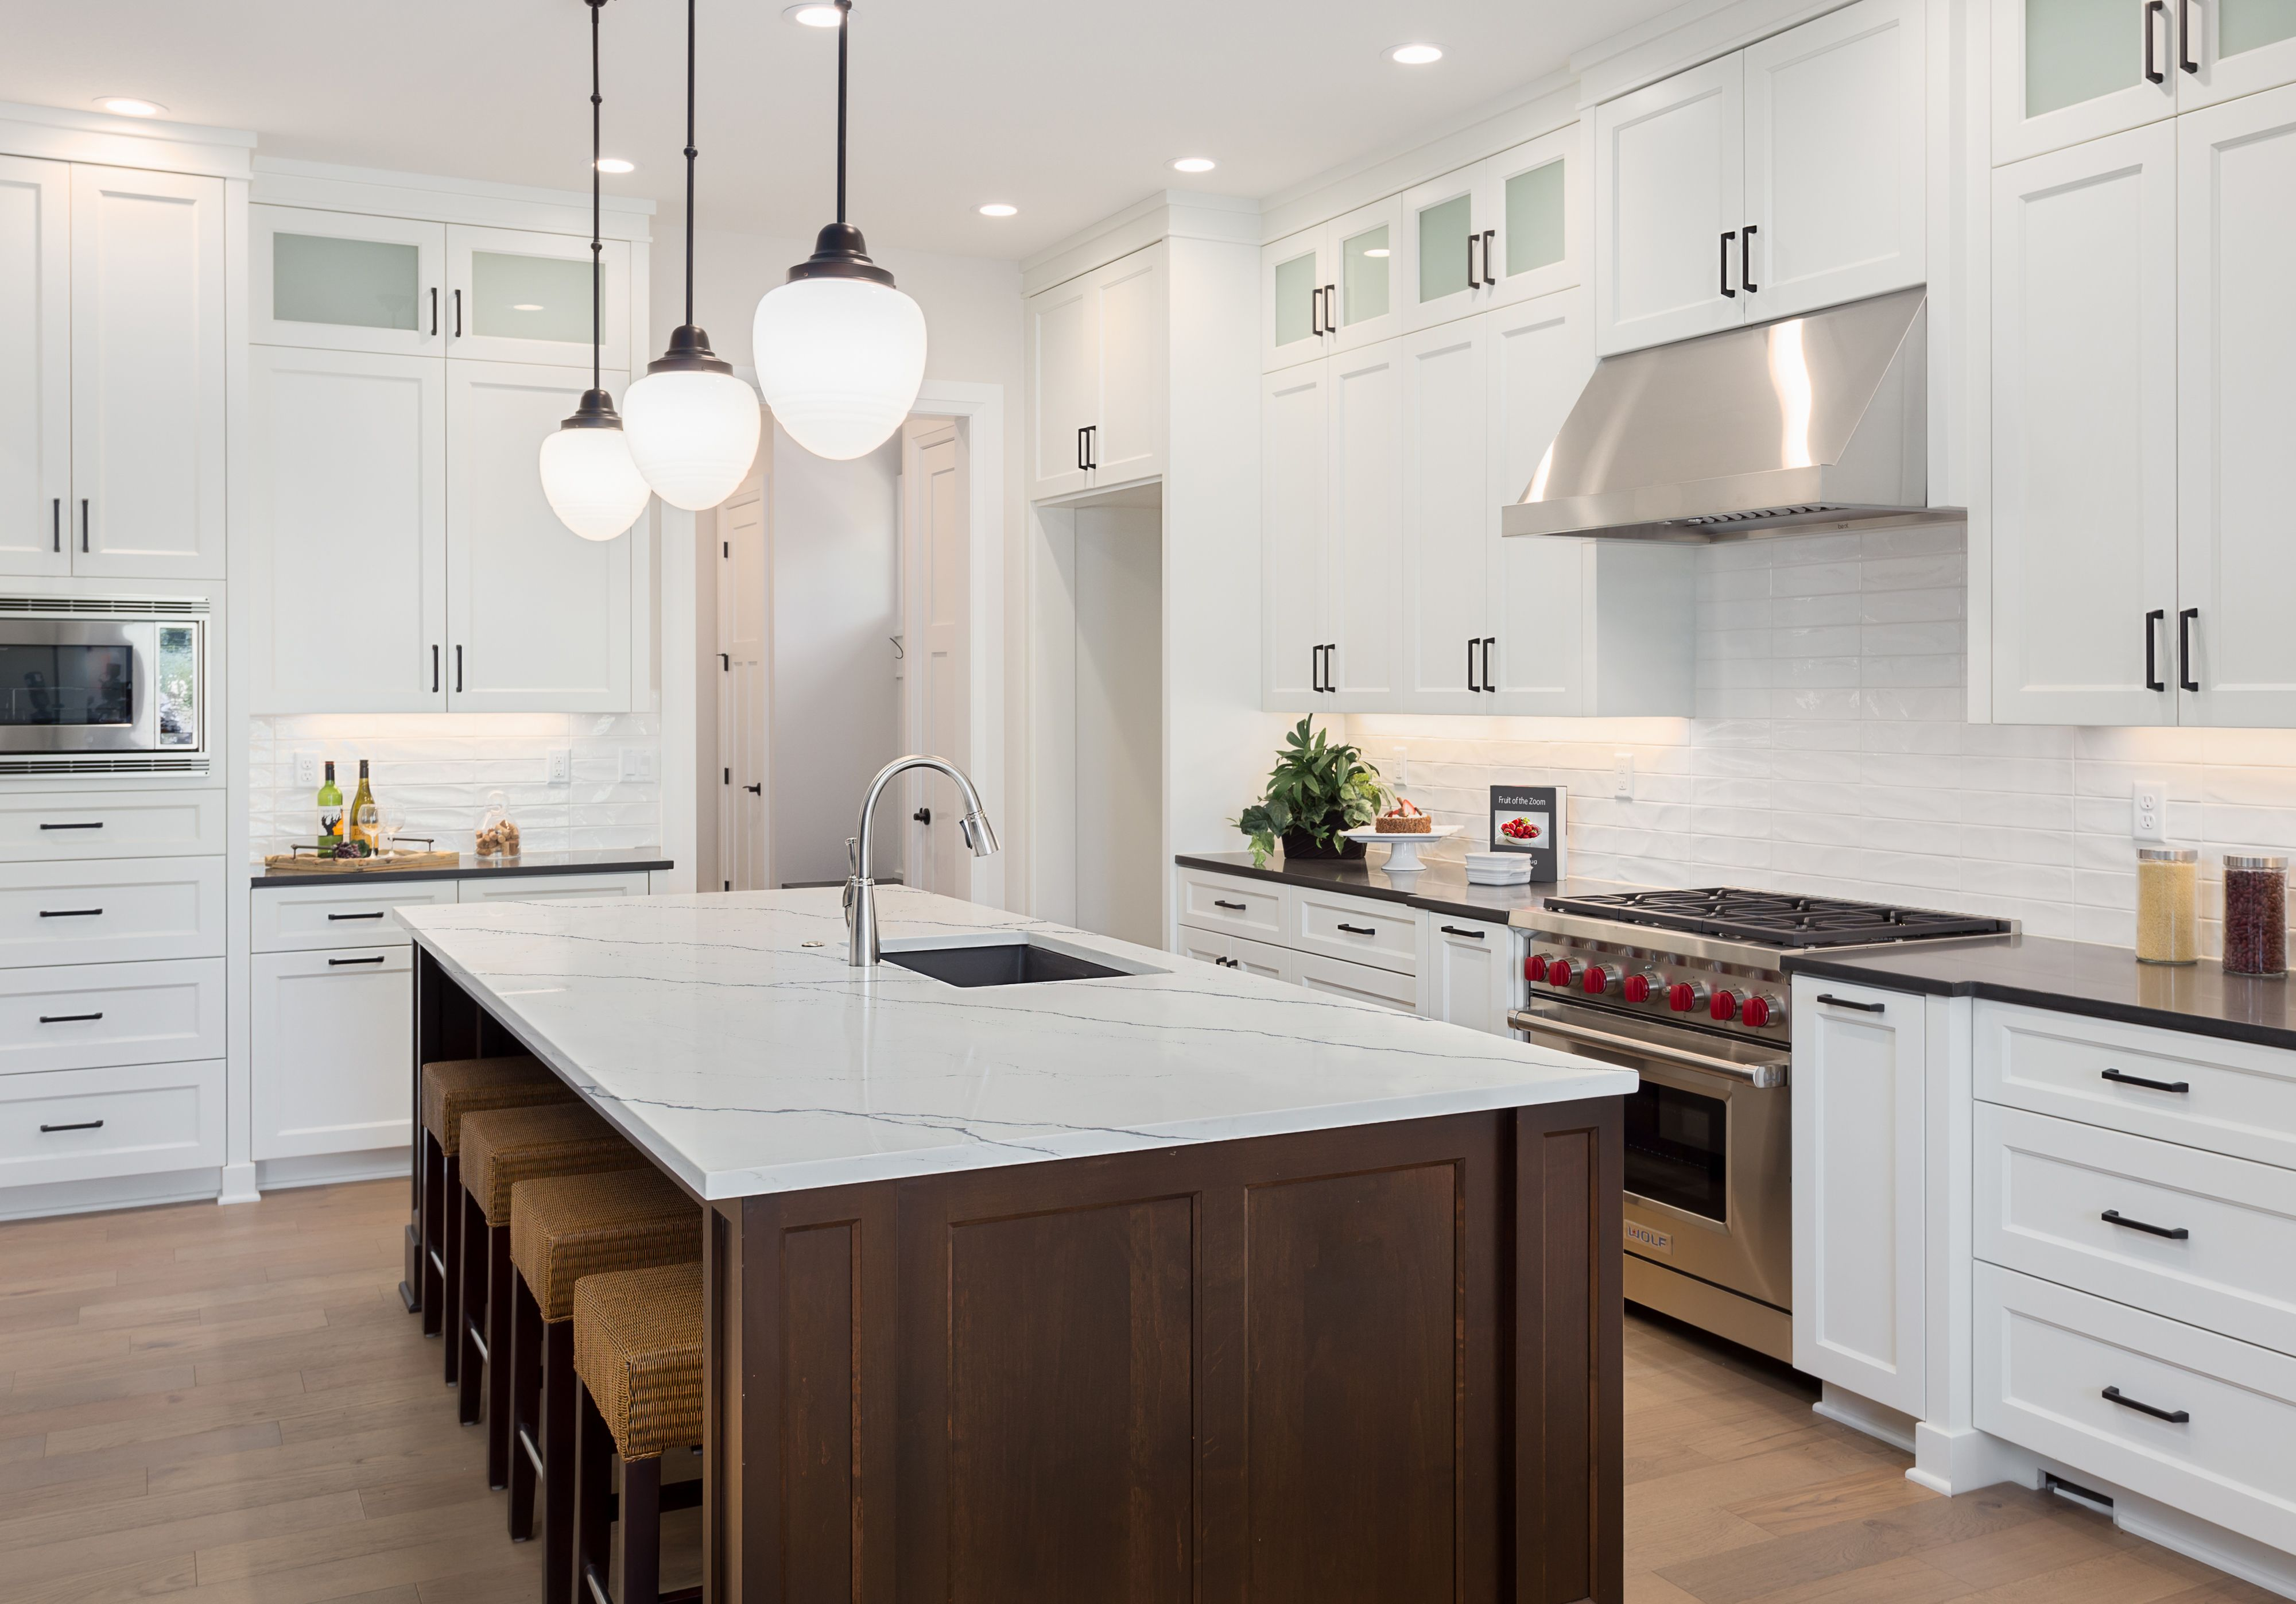 64 Deluxe Custom Kitchen Island Designs